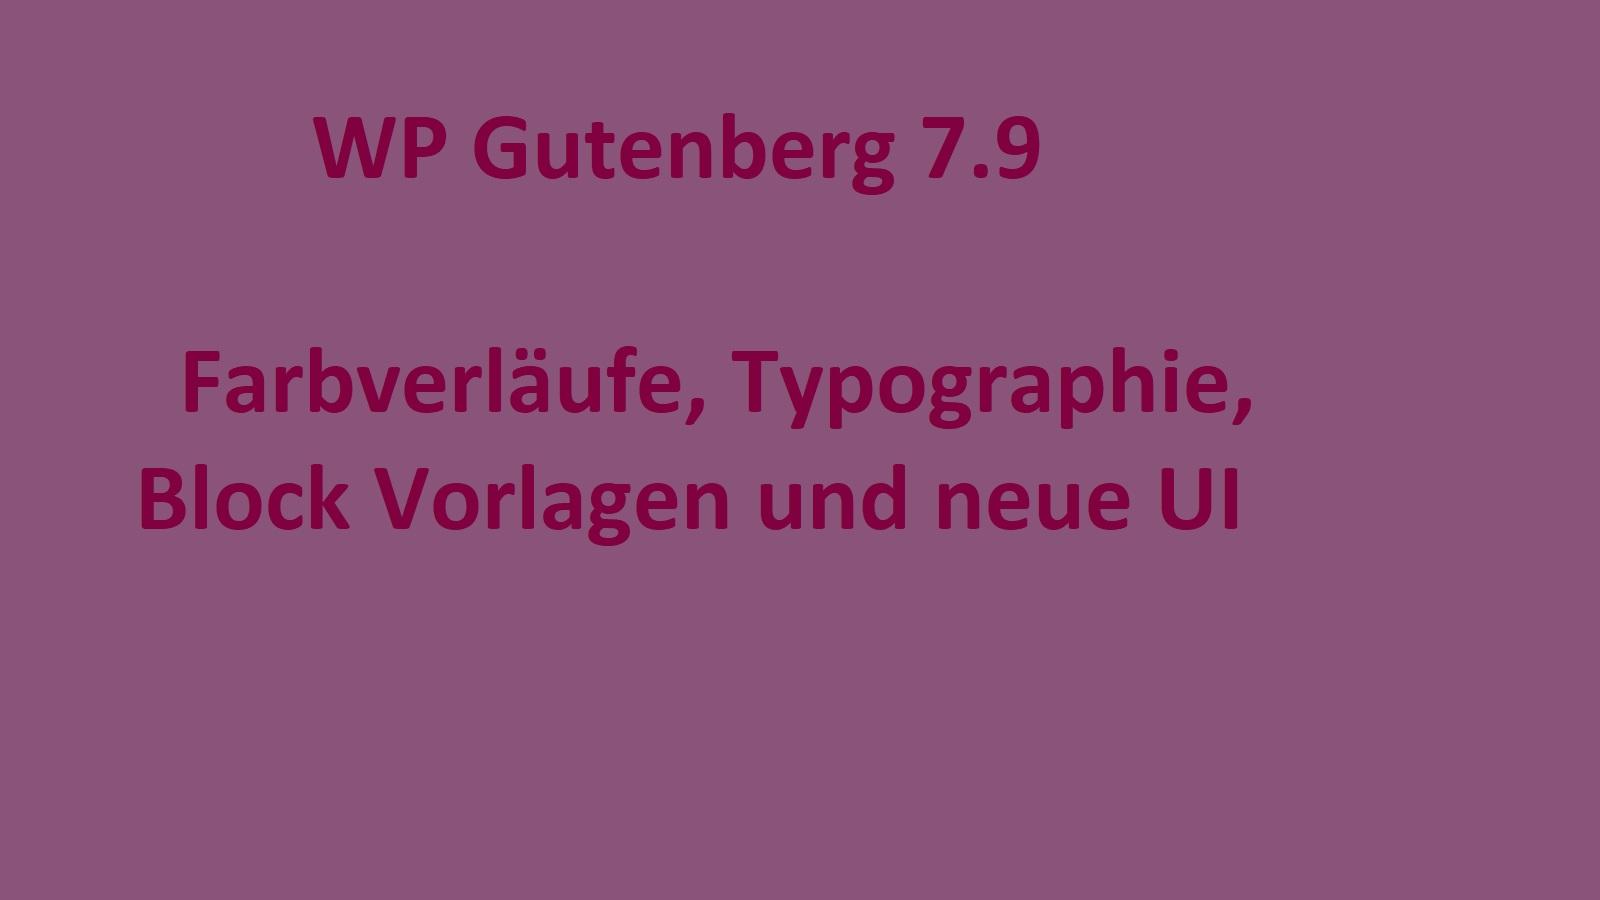 wordpress-gutenberg-7.9